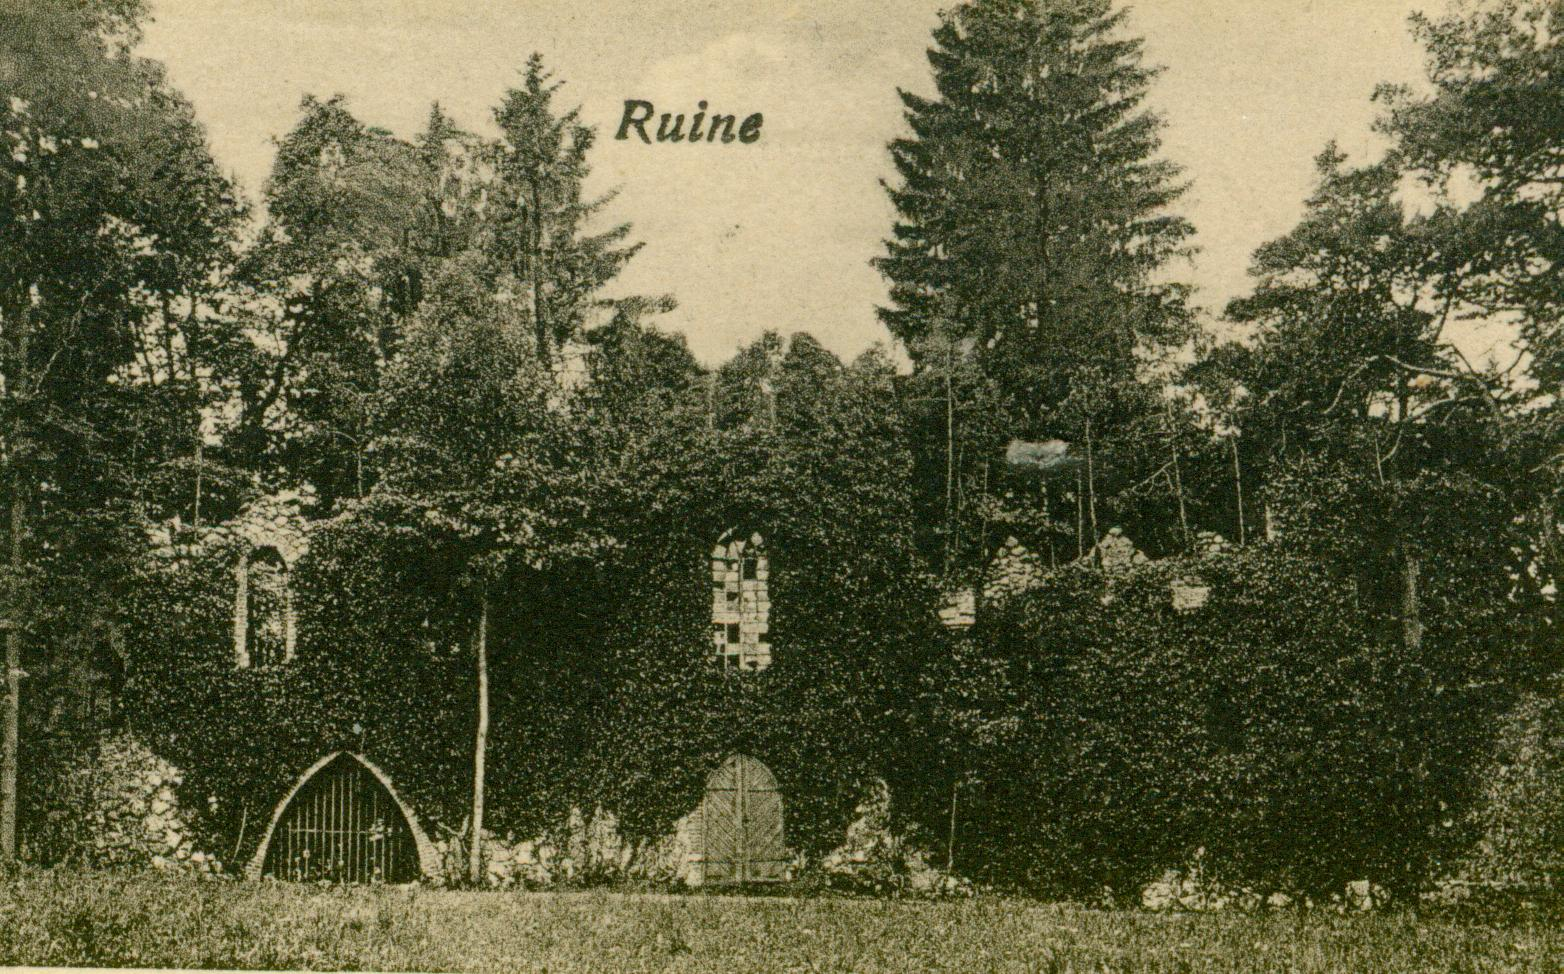 Glisno-romantyczne ruiny